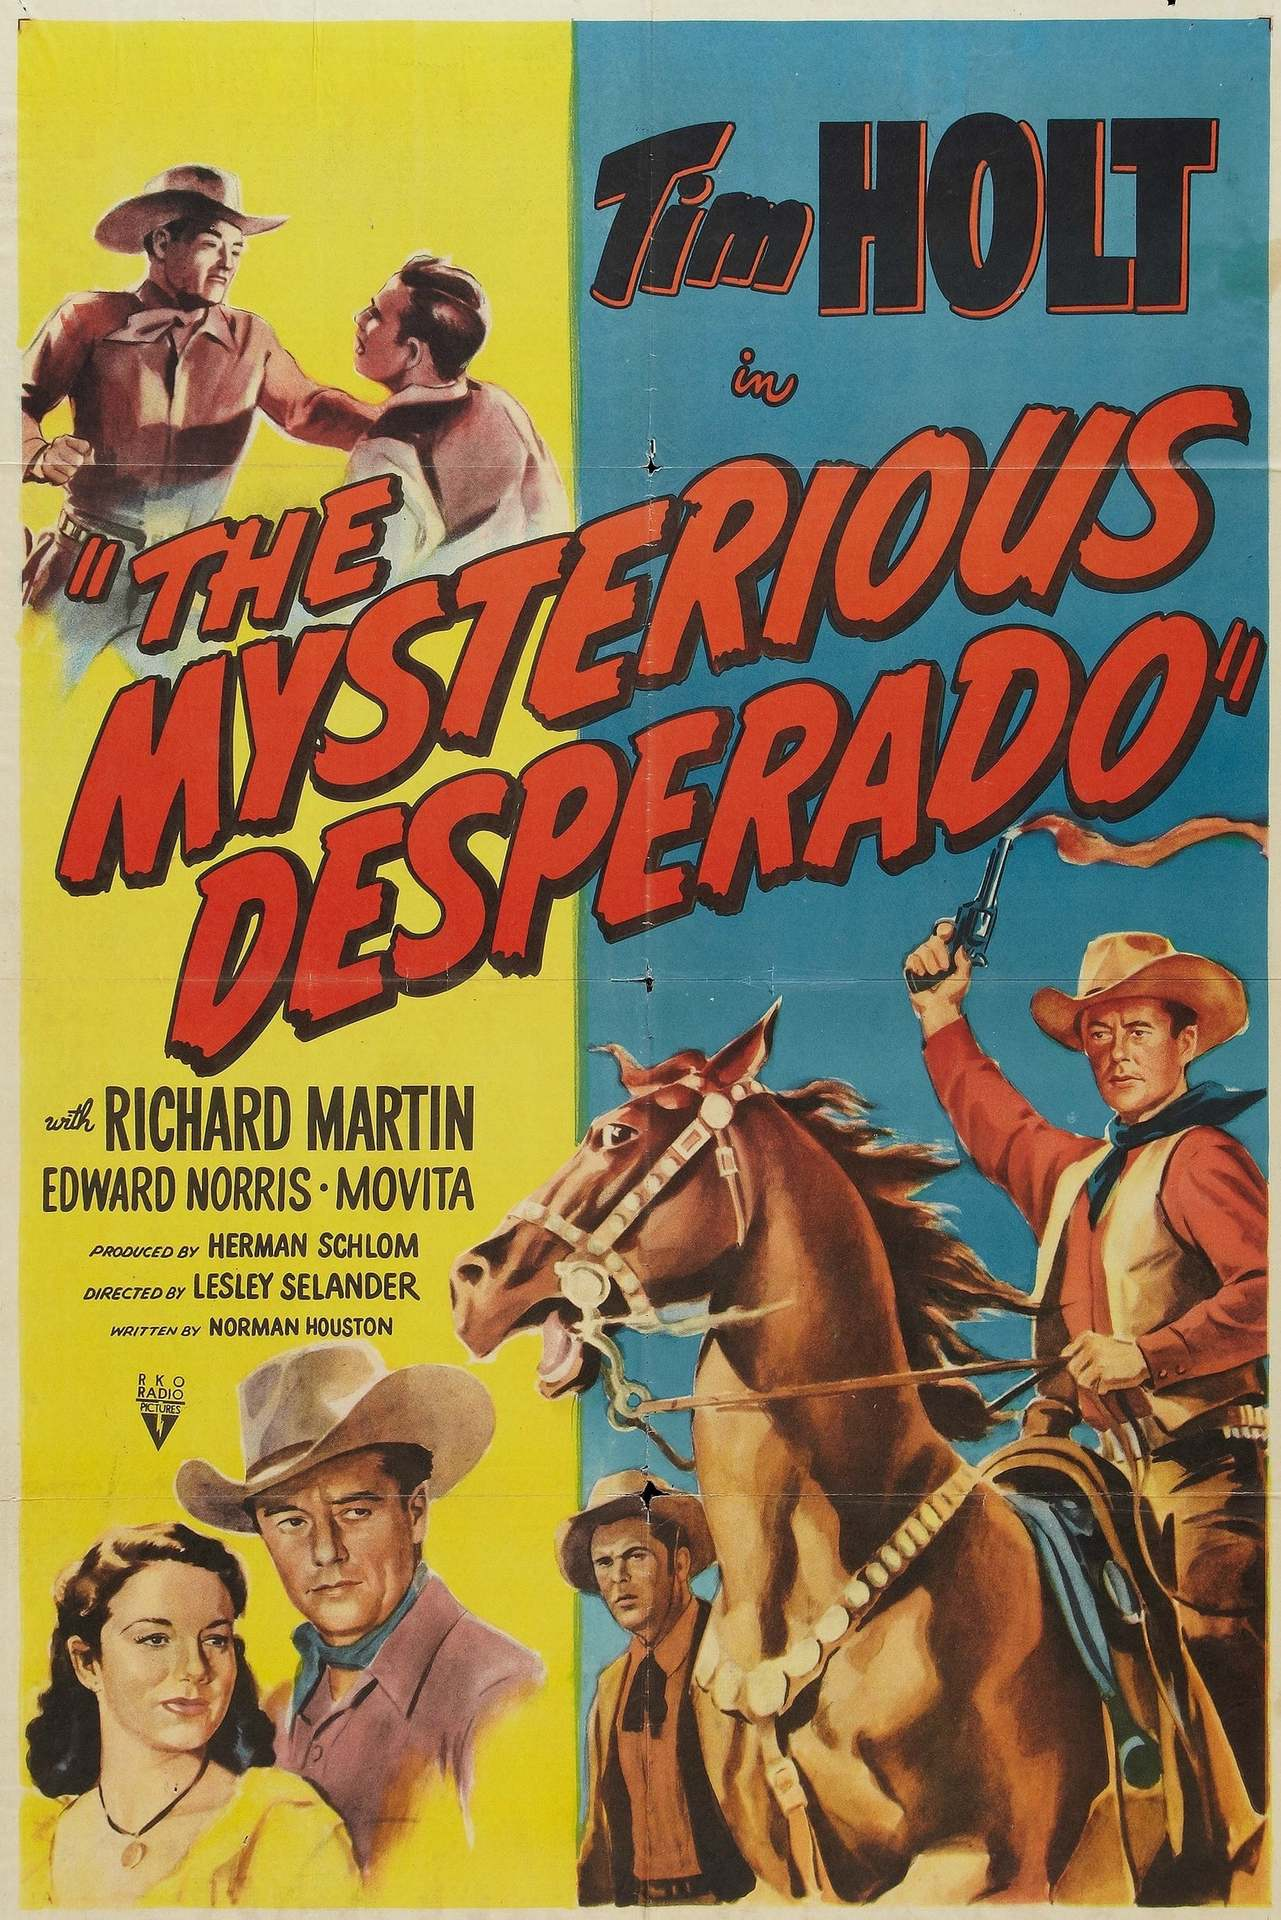 Постер фильма The Mysterious Desperado 1949